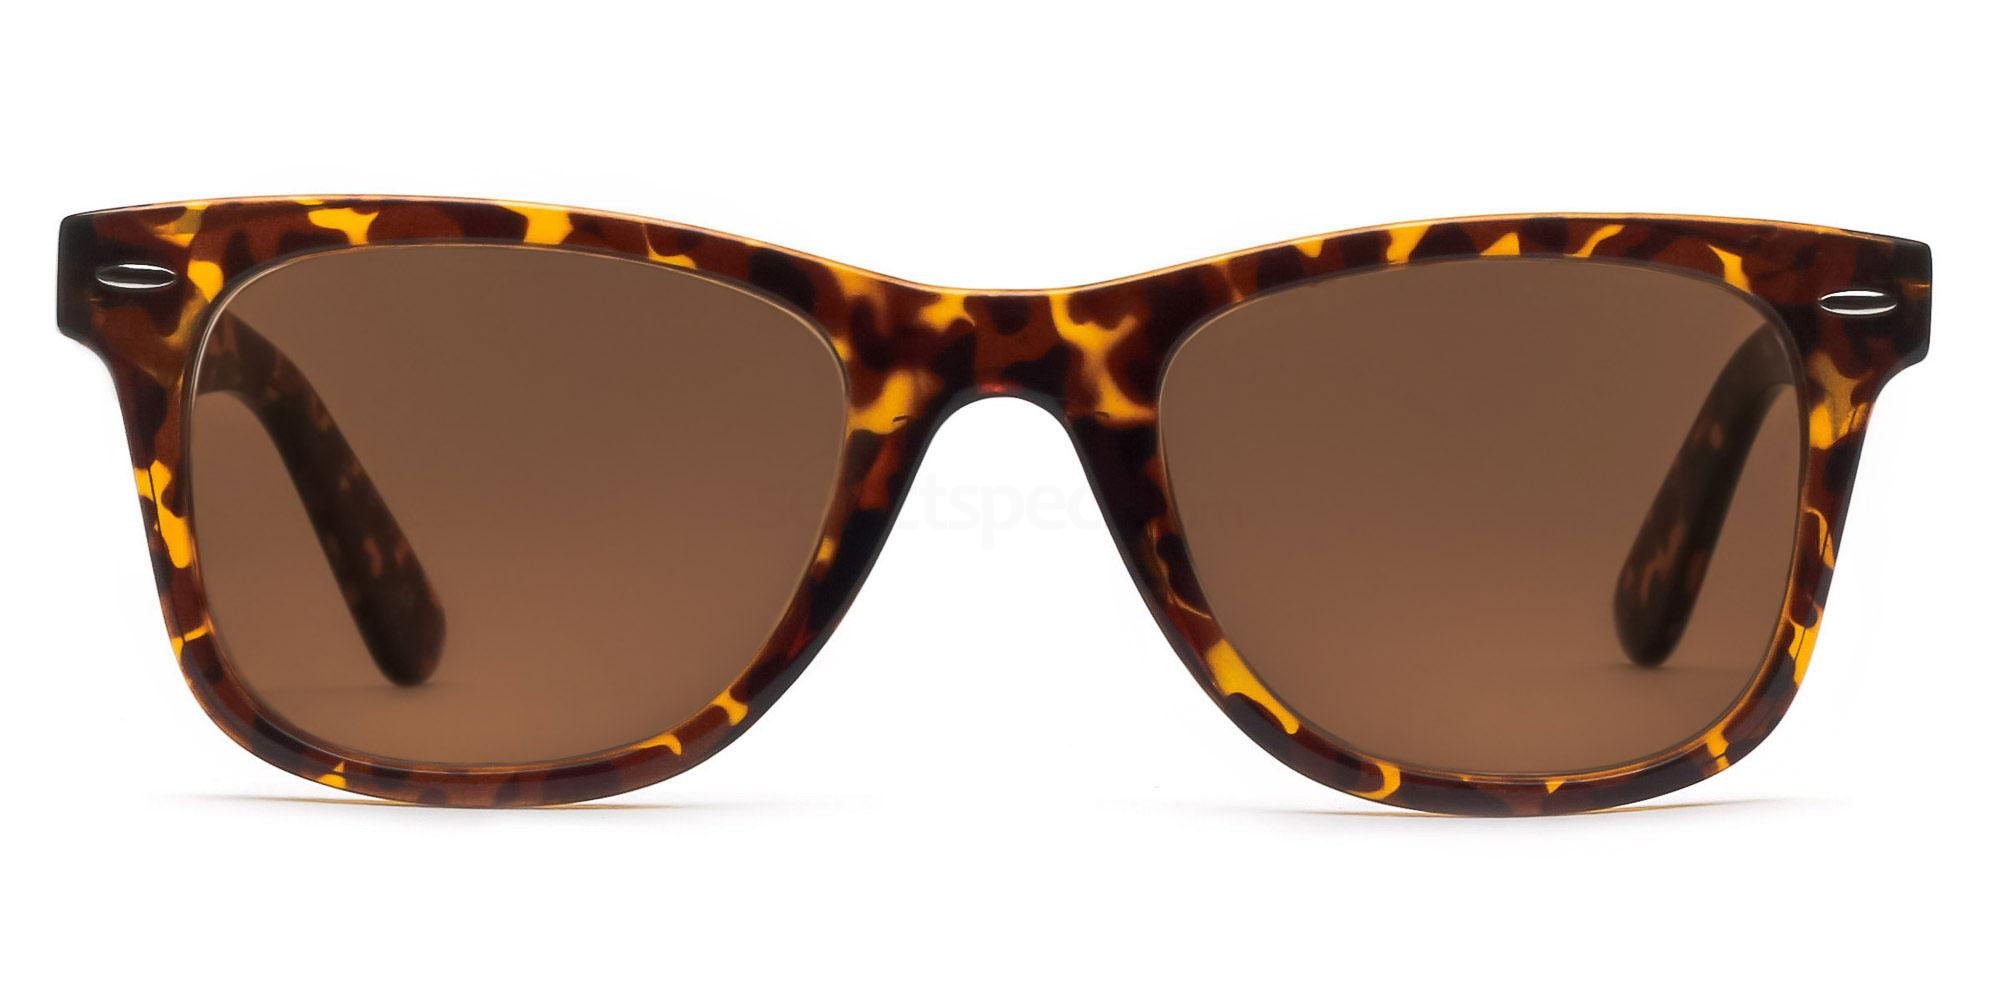 C04 Dark Brown P2429 - Havana (Sunglasses) Sunglasses, Savannah